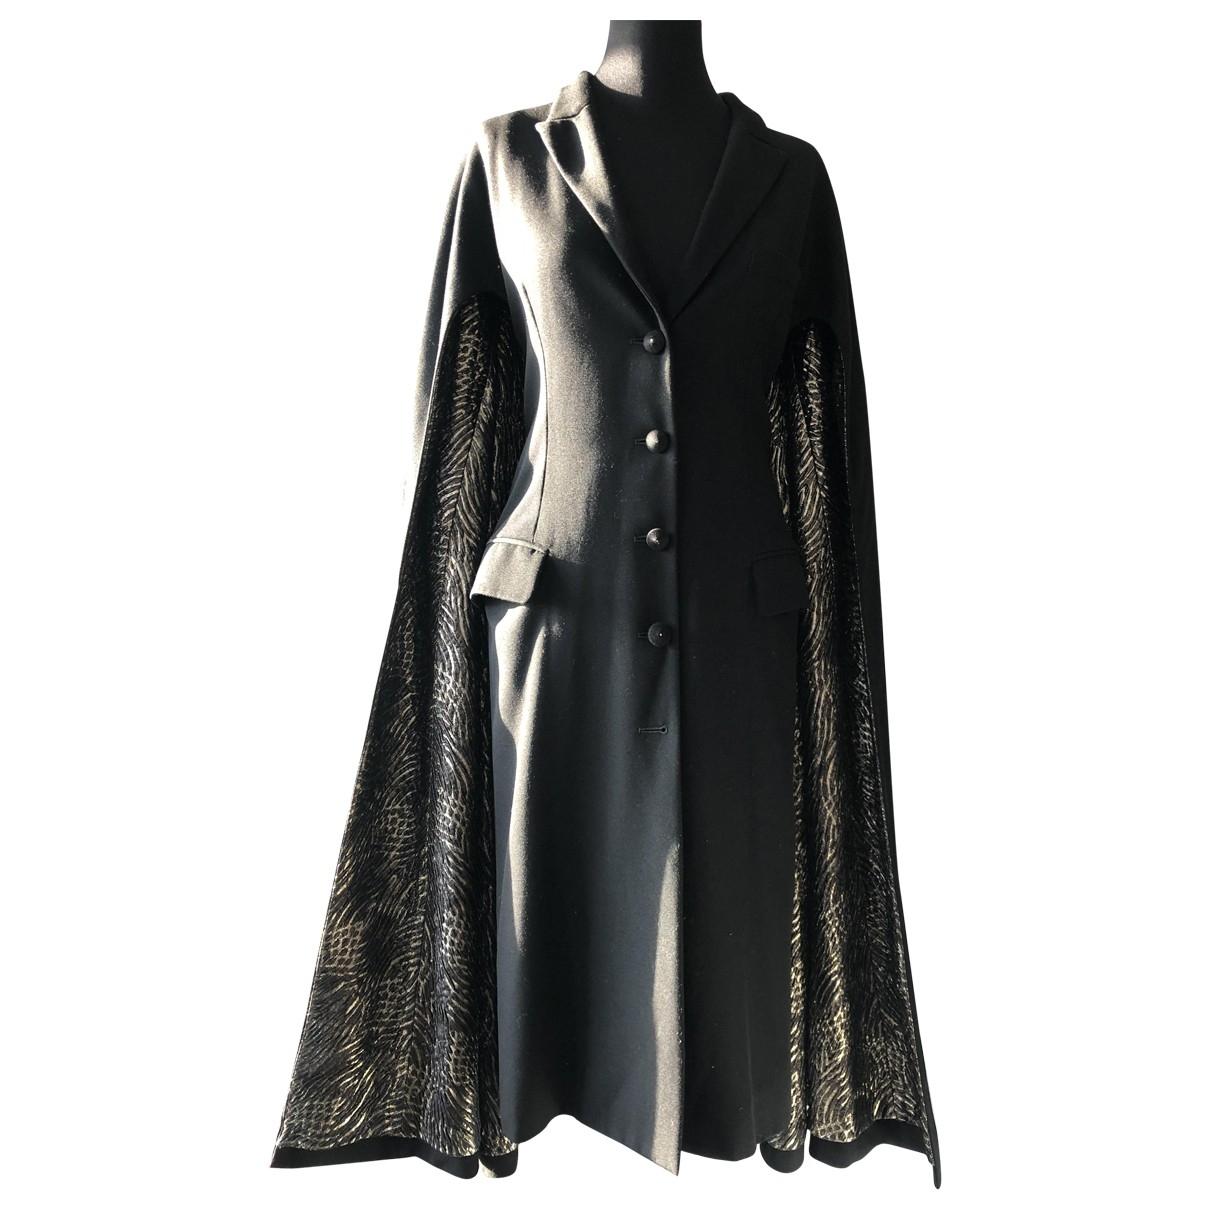 Yves Saint Laurent \N Black Wool jacket for Women 40 FR